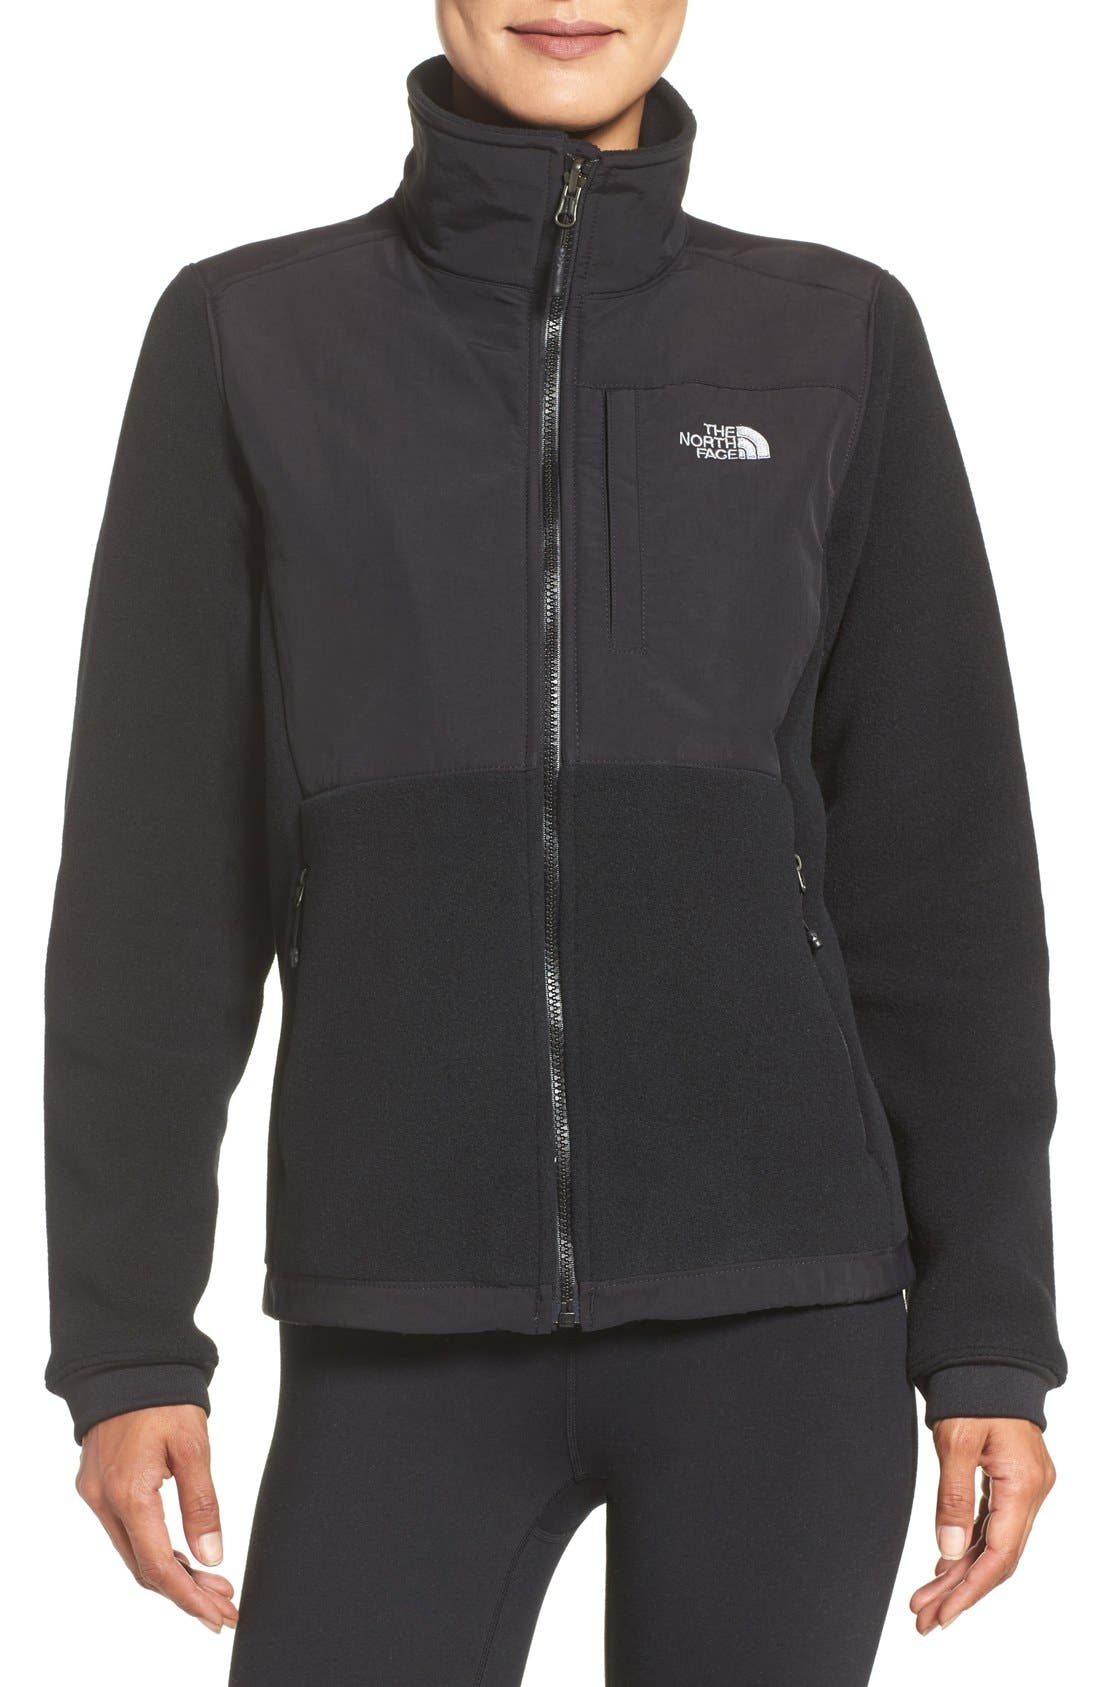 Alternate Image 1 Selected - The North Face Denali 2 Jacket